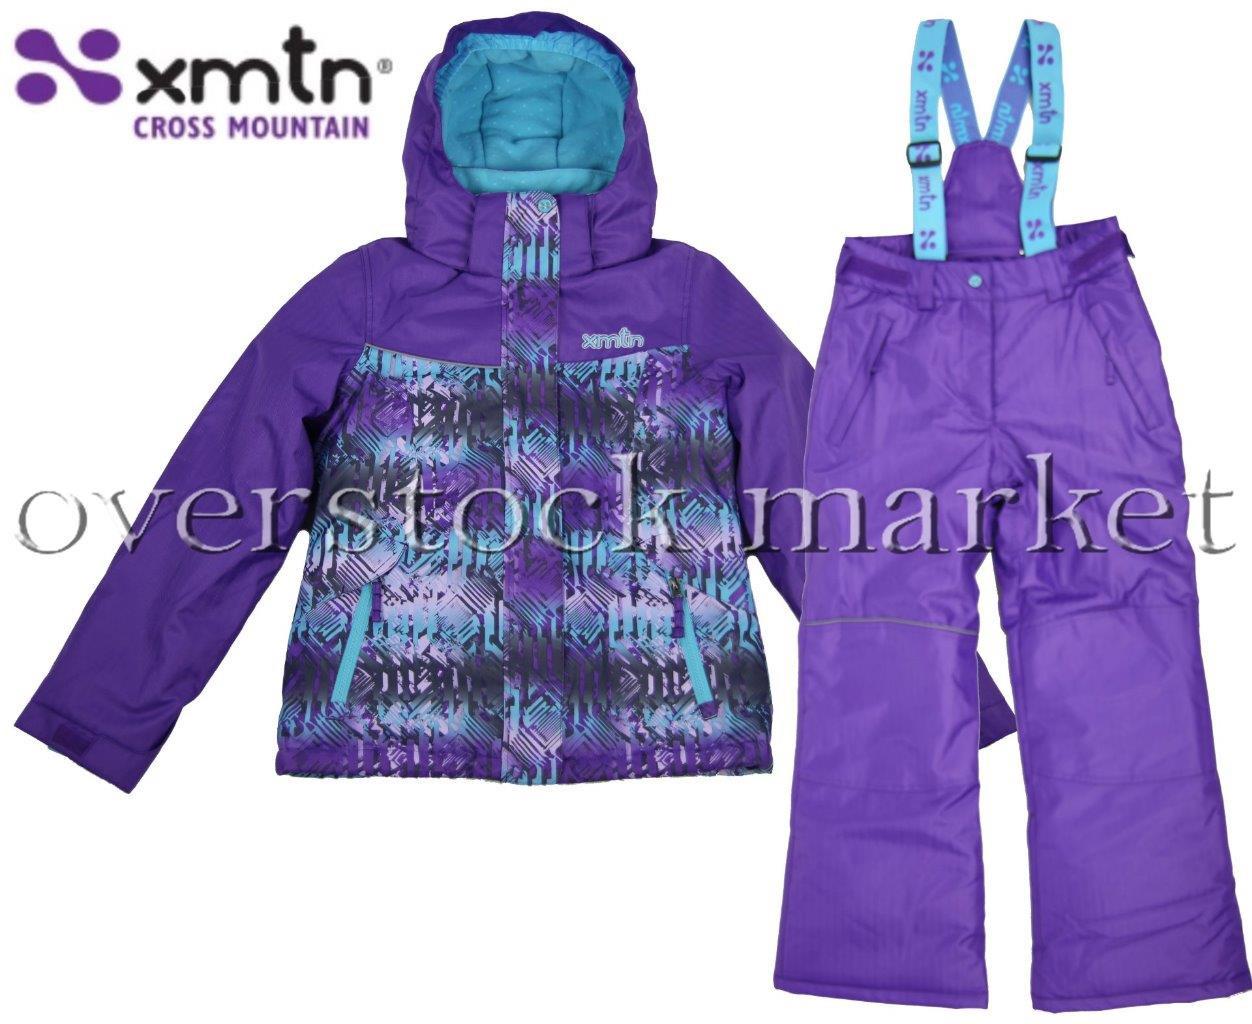 XMTN GIRLS WINTER COAT & BIB PANT SET SKIBOARDER SNOW SETS